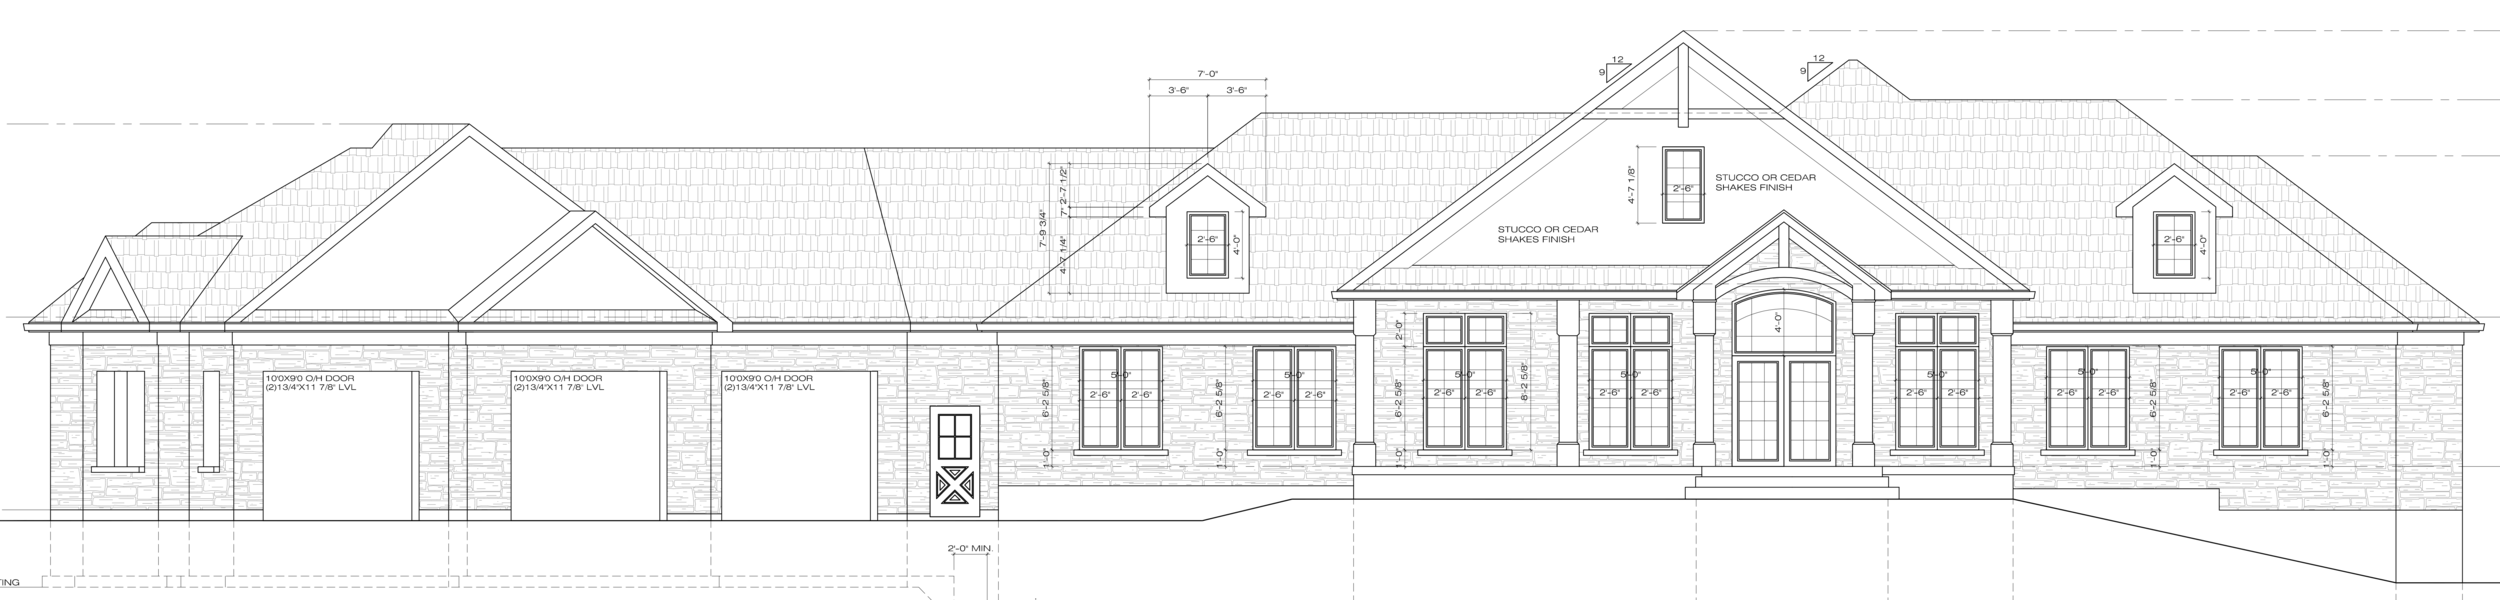 Previous Elevation Design